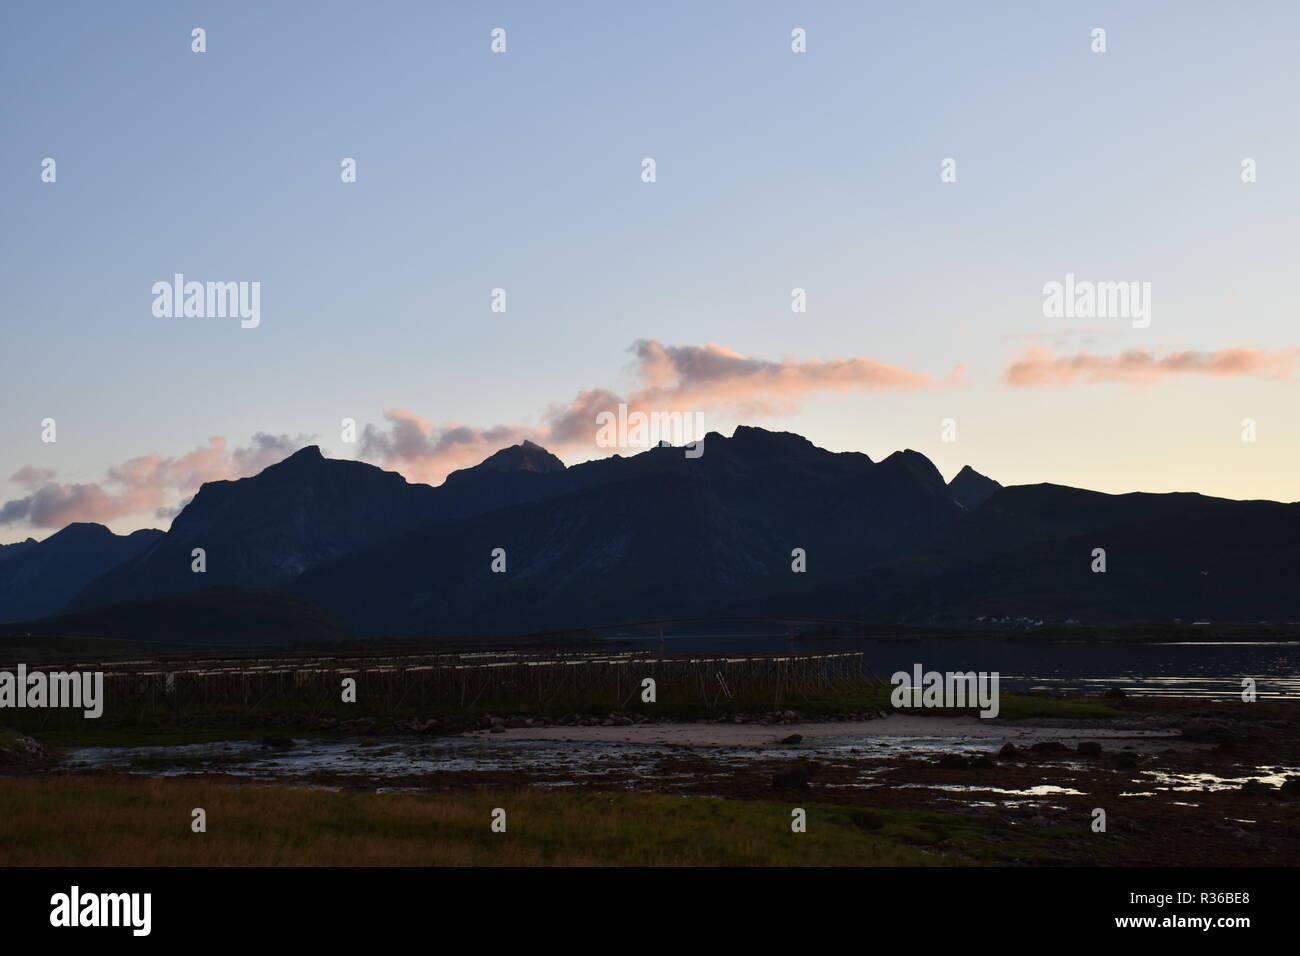 "Lofoten, Norwegen, Abend, Abendstimmung, Sonnenuntergang, rot, ""Abendrot"", Skagsanden, Flakstad, ebbe, Ufer, Küste, Seetang, Tang, Bucht, Vareidsundet, Immagini Stock"